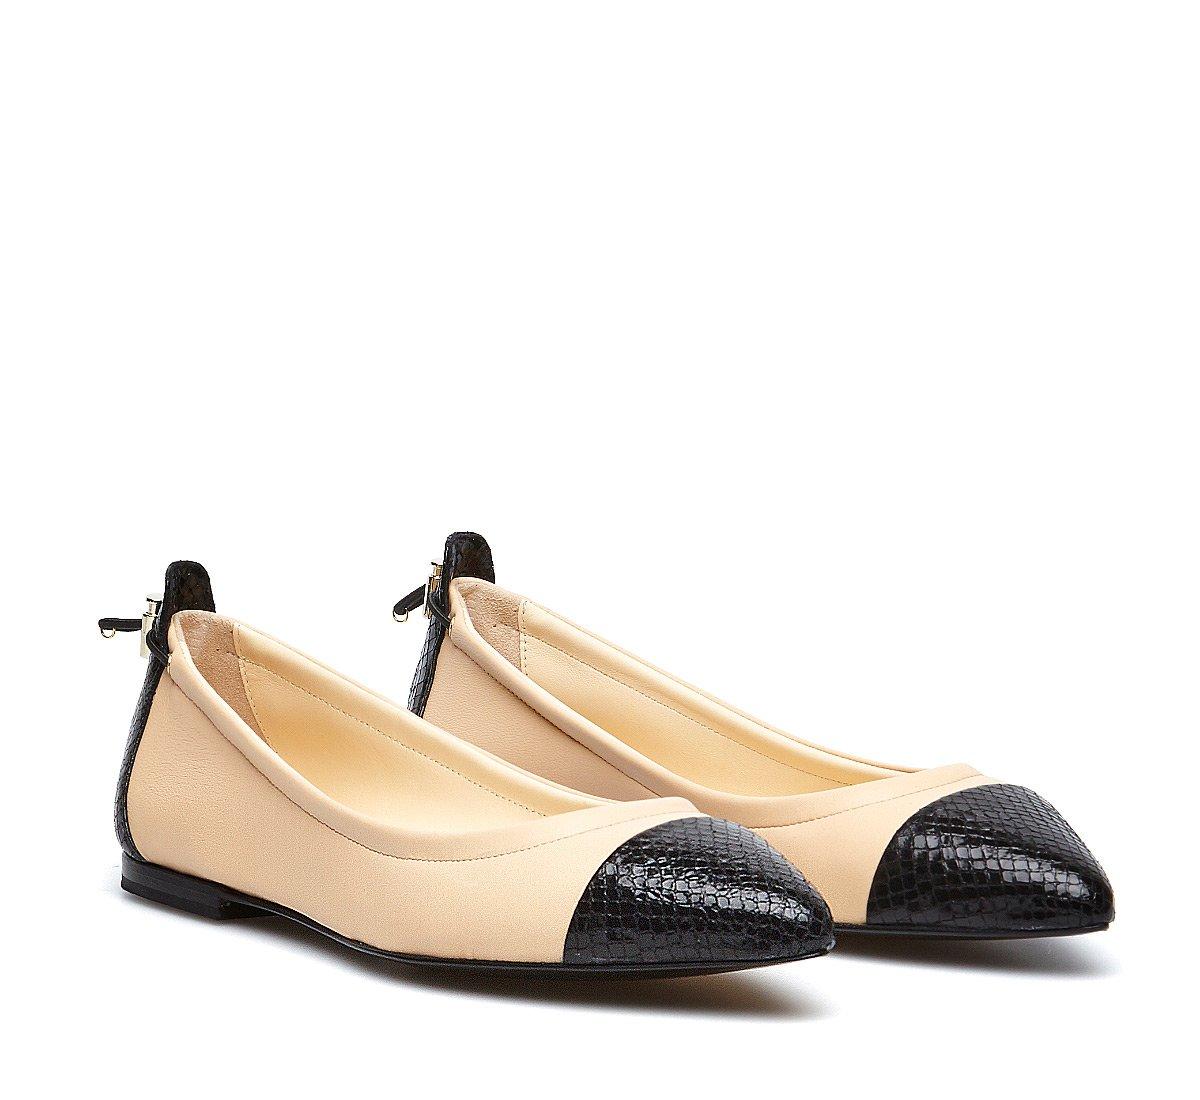 Fabi classic soft nappa ballerinas